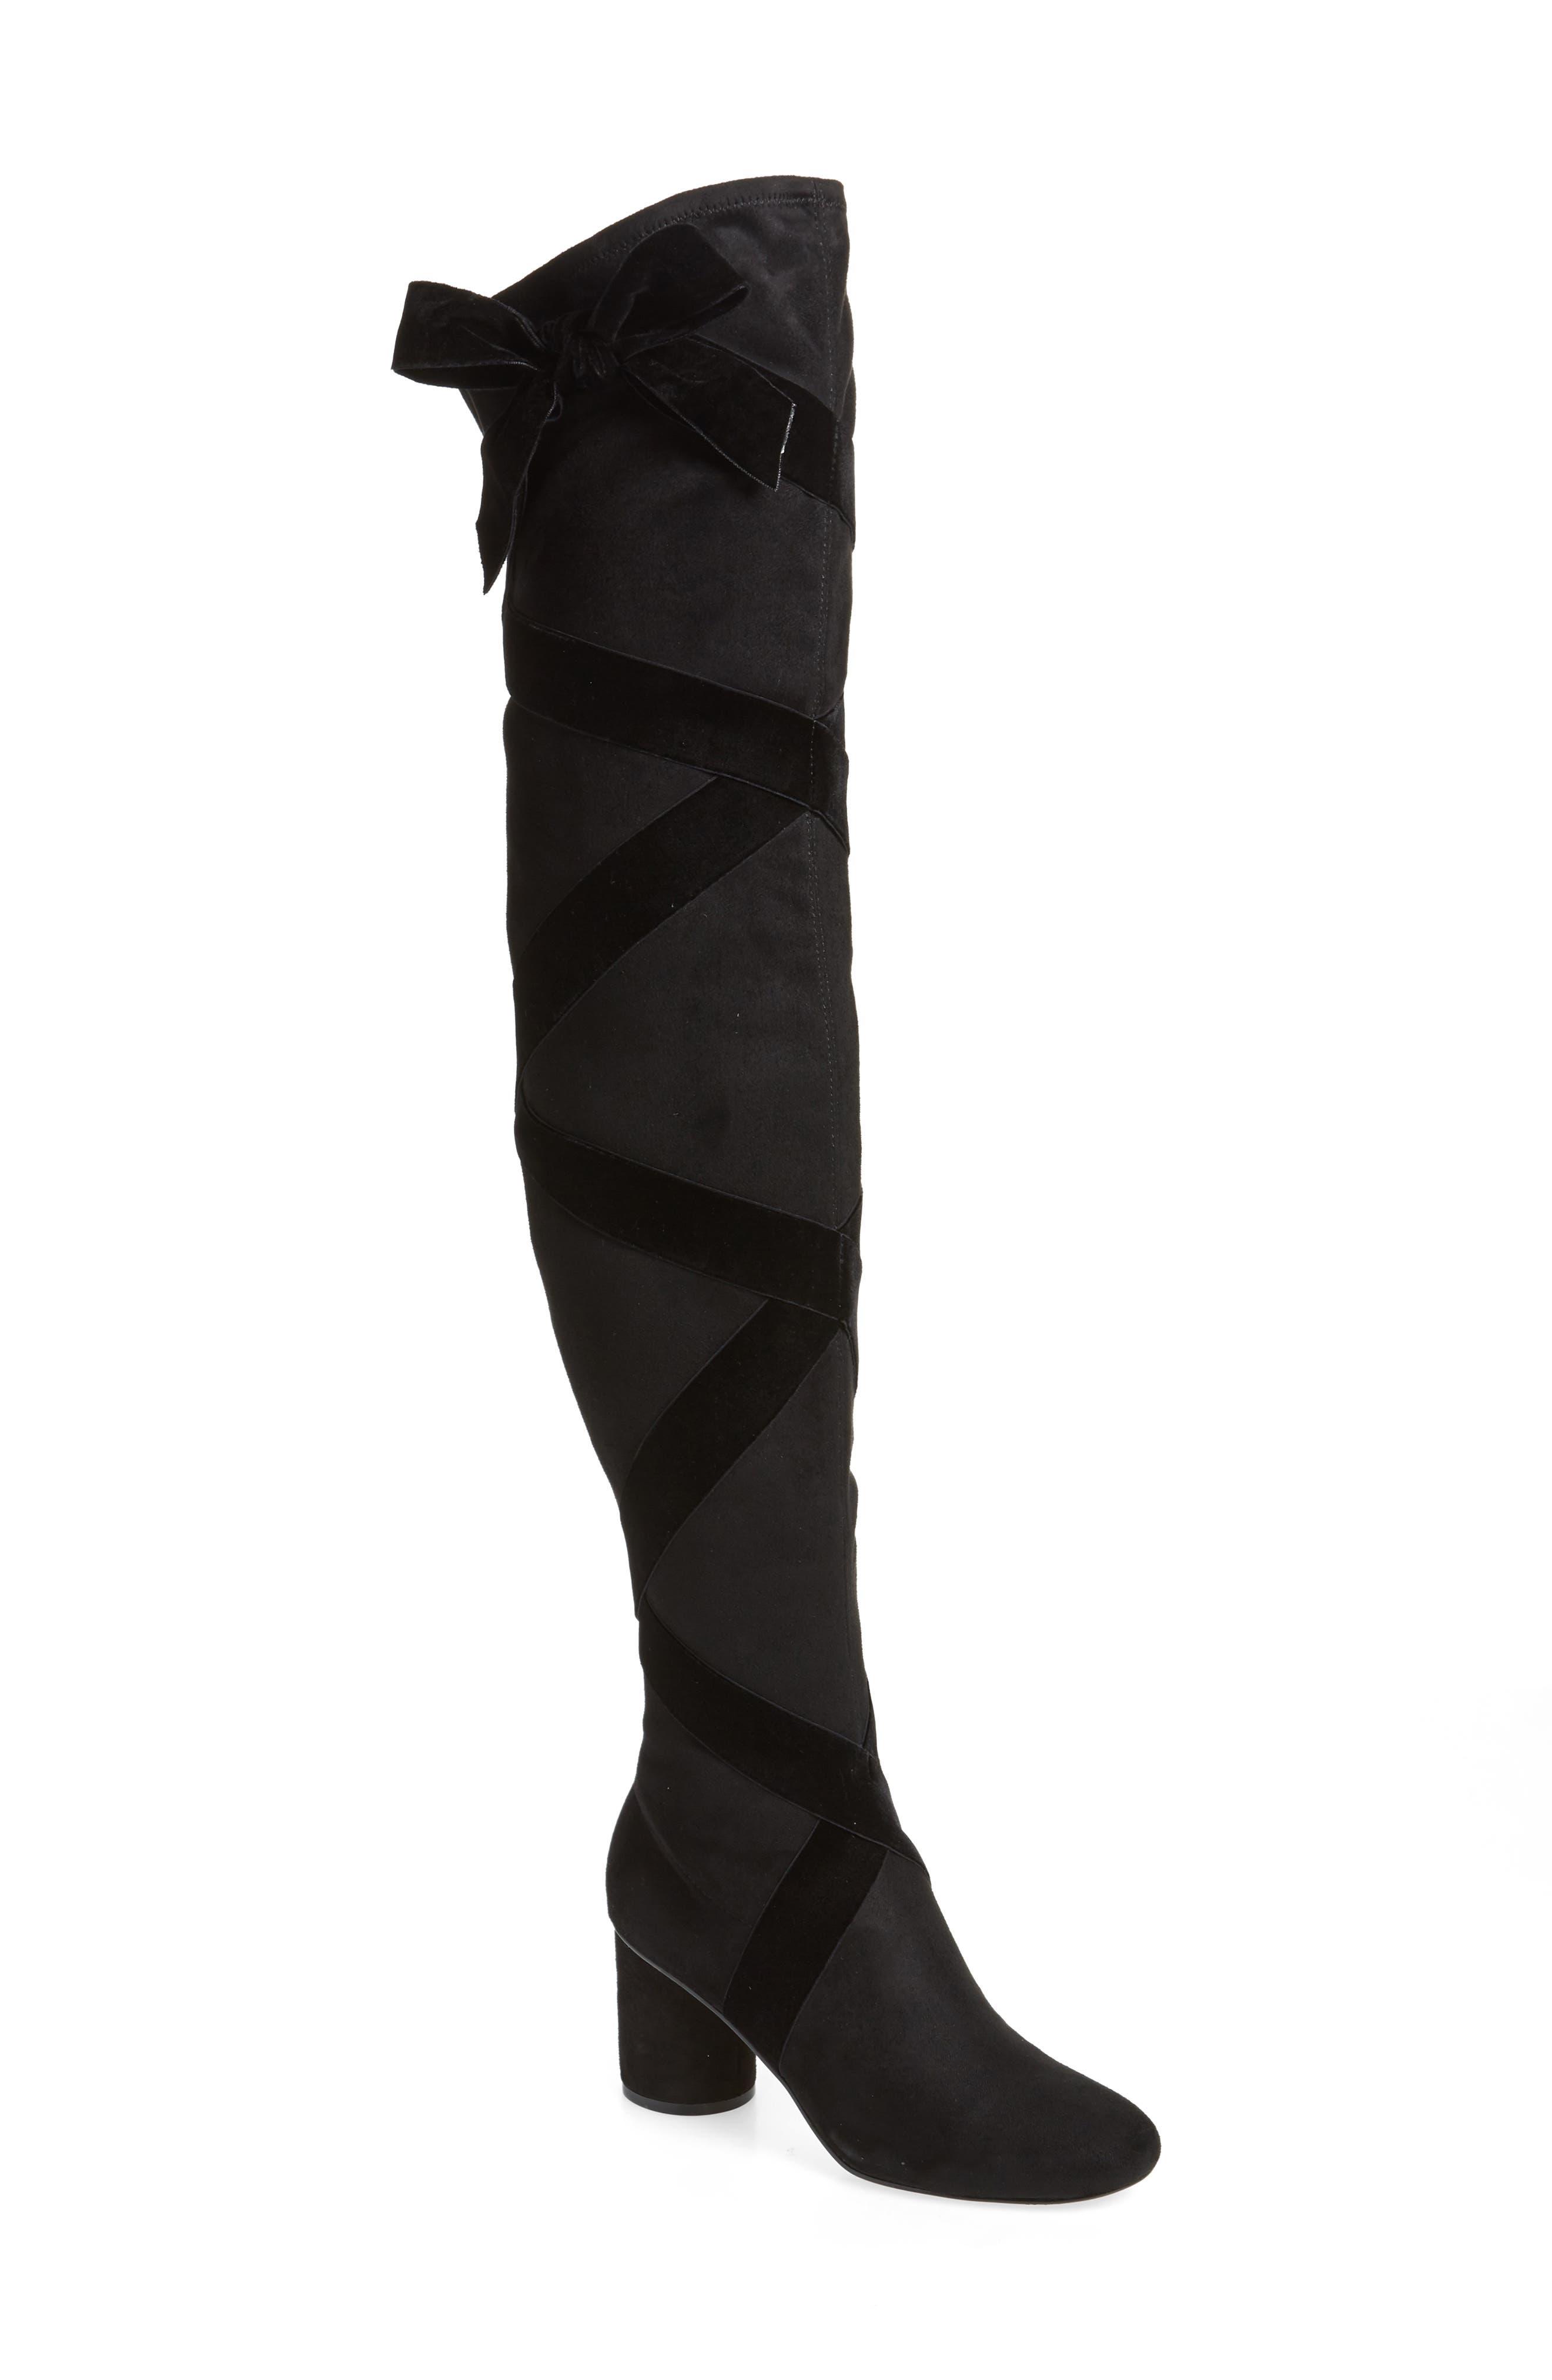 Karl Lagerfeld Paris Faren Over The Knee Boot, Black